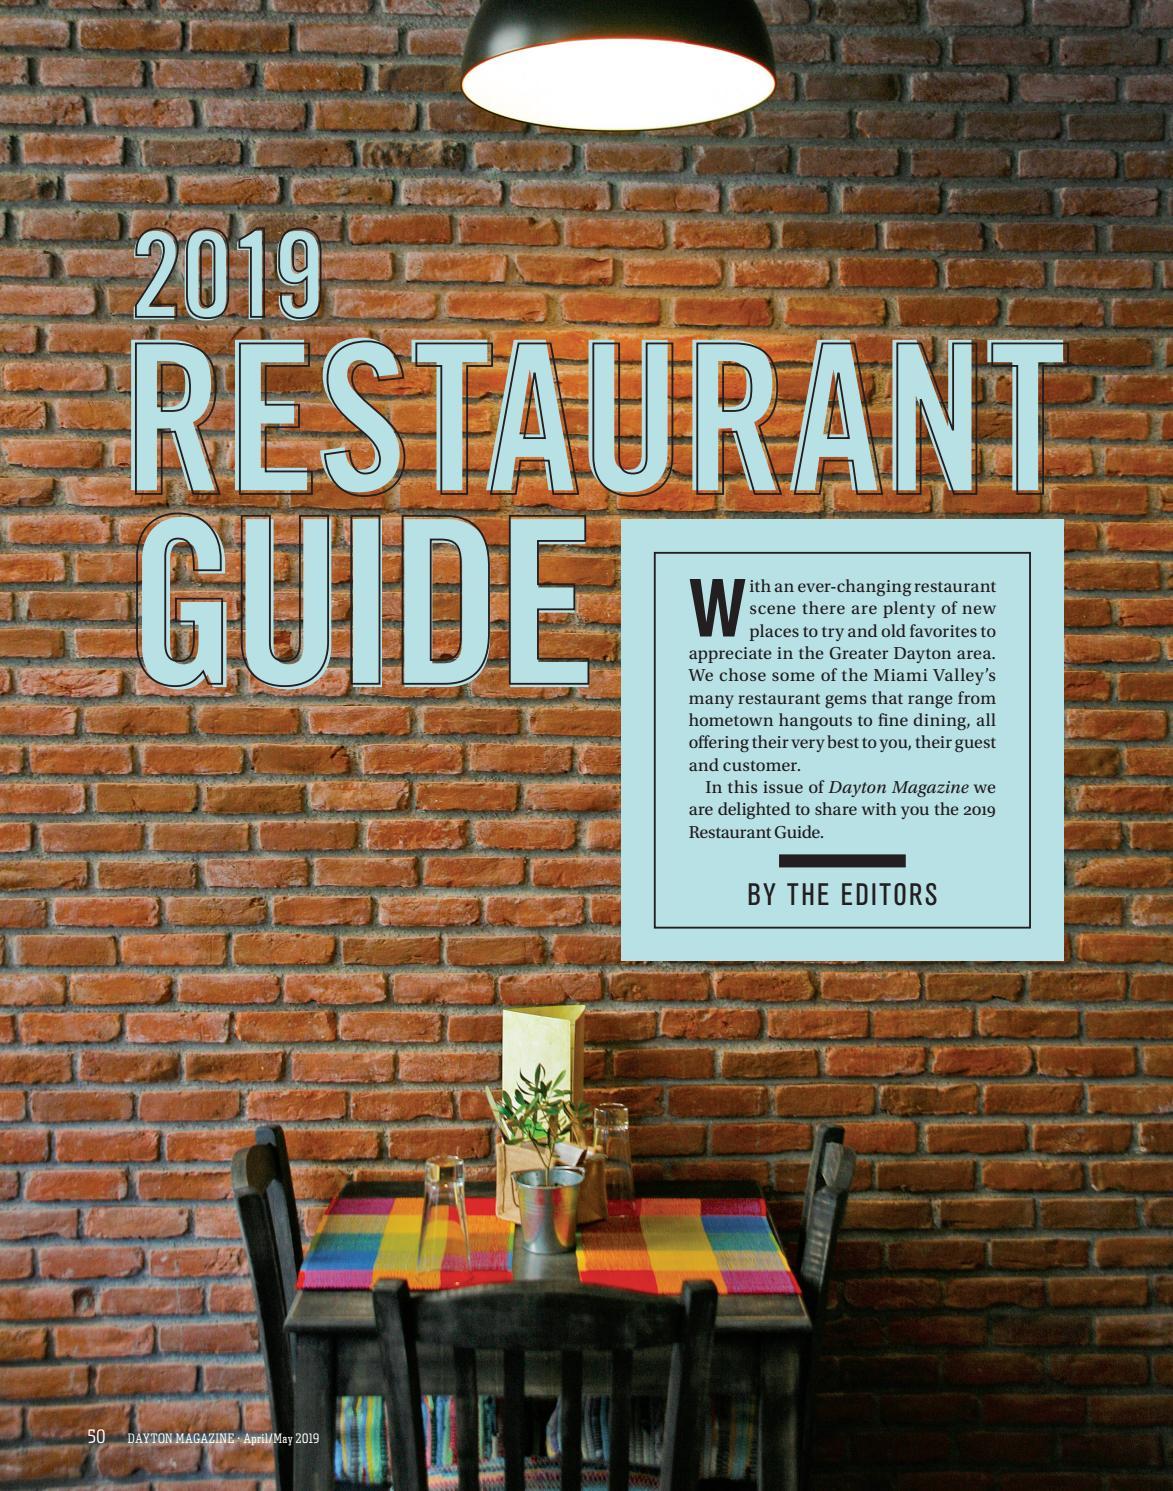 Stupendous Dayton Restaurant Guide 2019 By Cincy Magazine Issuu Download Free Architecture Designs Rallybritishbridgeorg